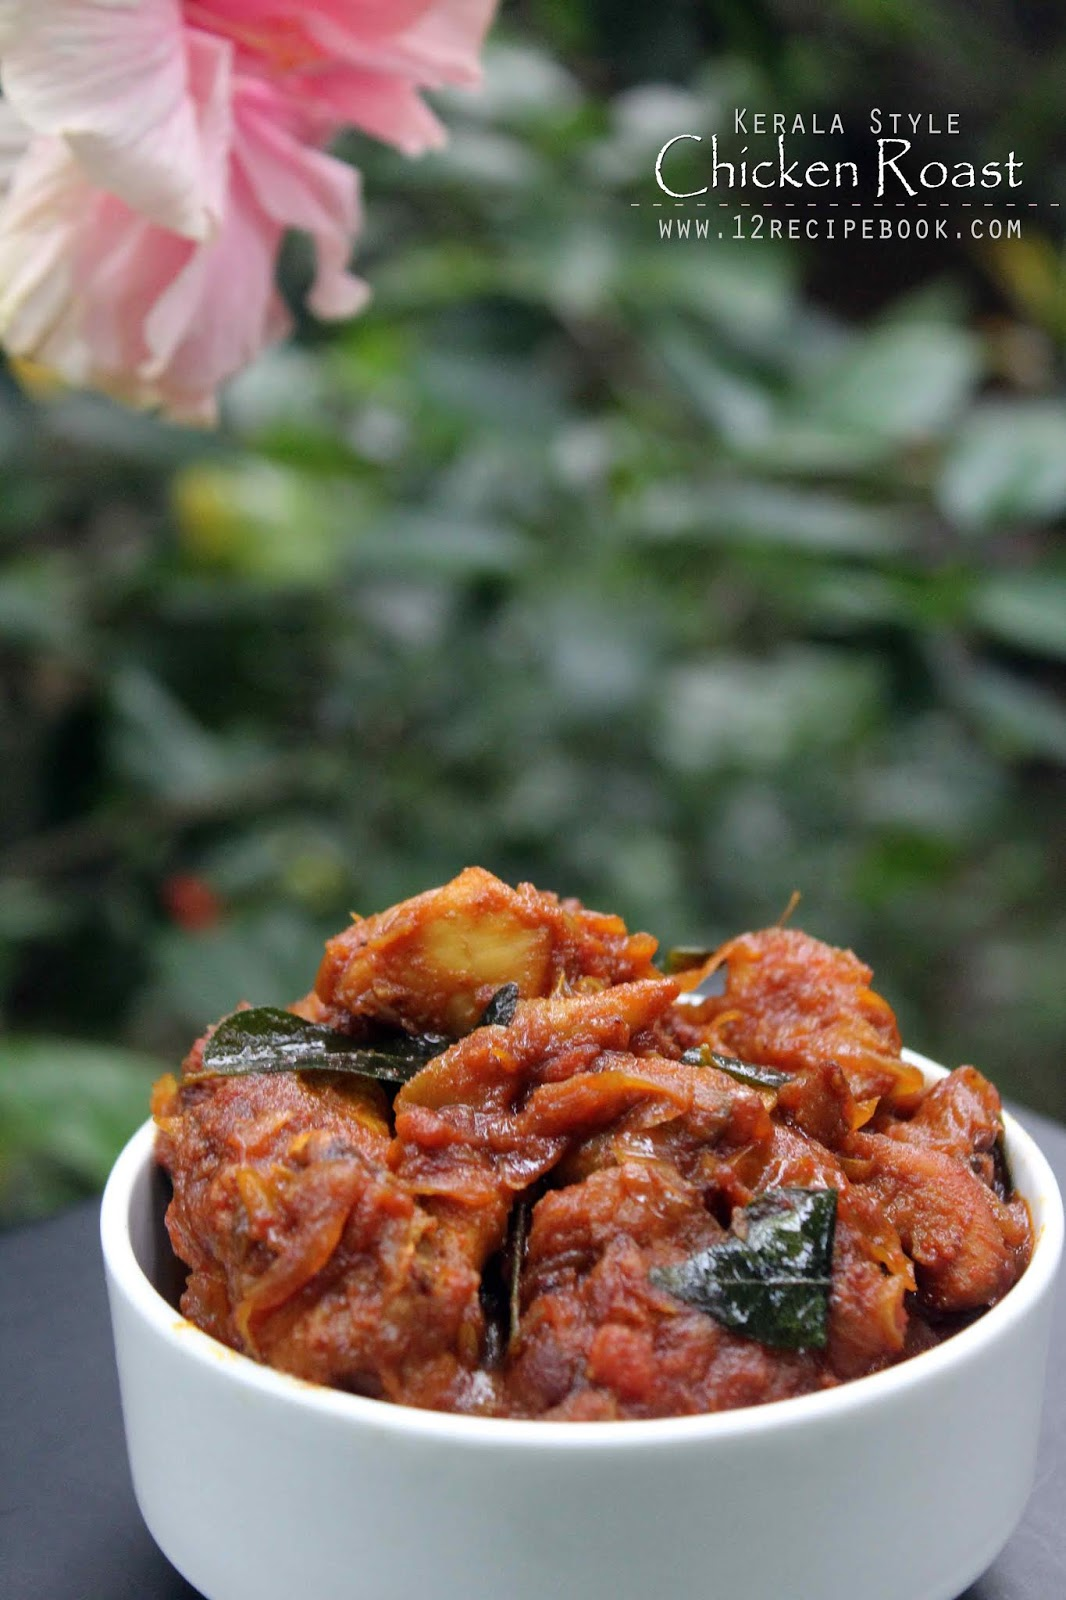 Kerala Style Spicy Chicken Roast - Recipe Book